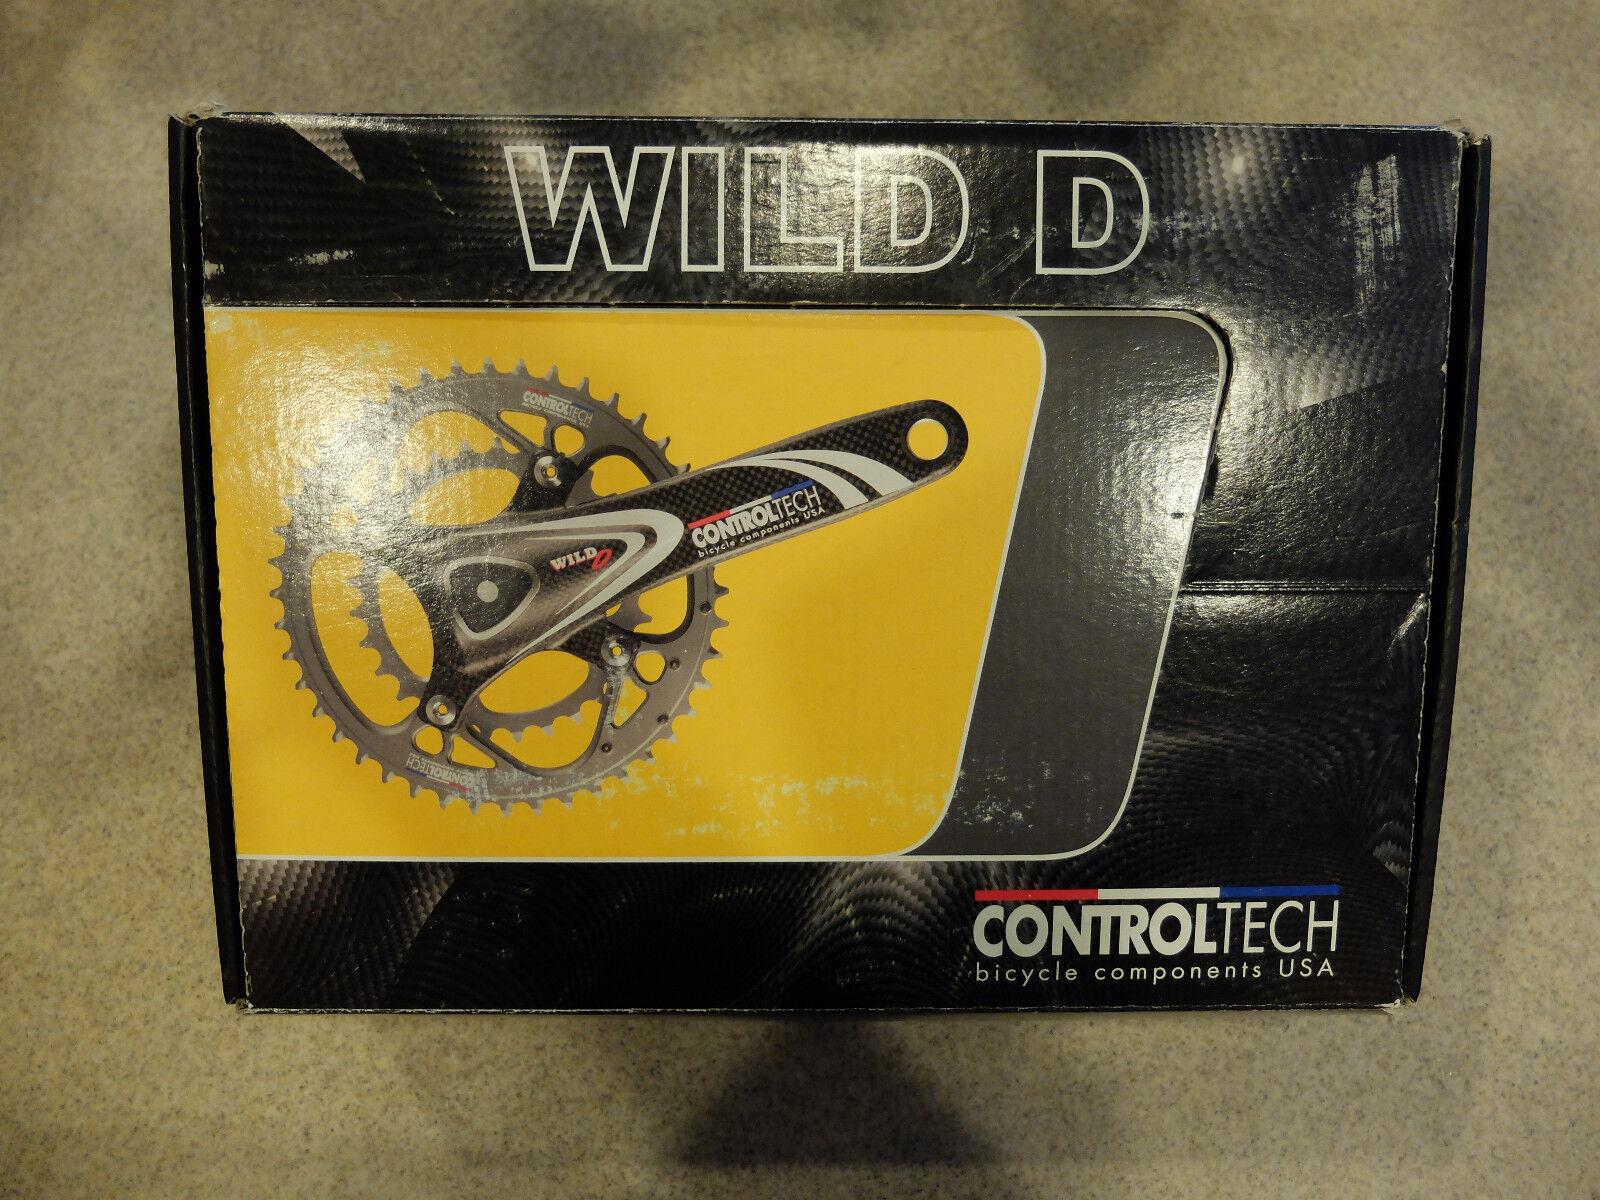 Control Tech Wild D 9 10-Speed Crankset with Decal, 175mm 38 x 24T, Cochebon blanco